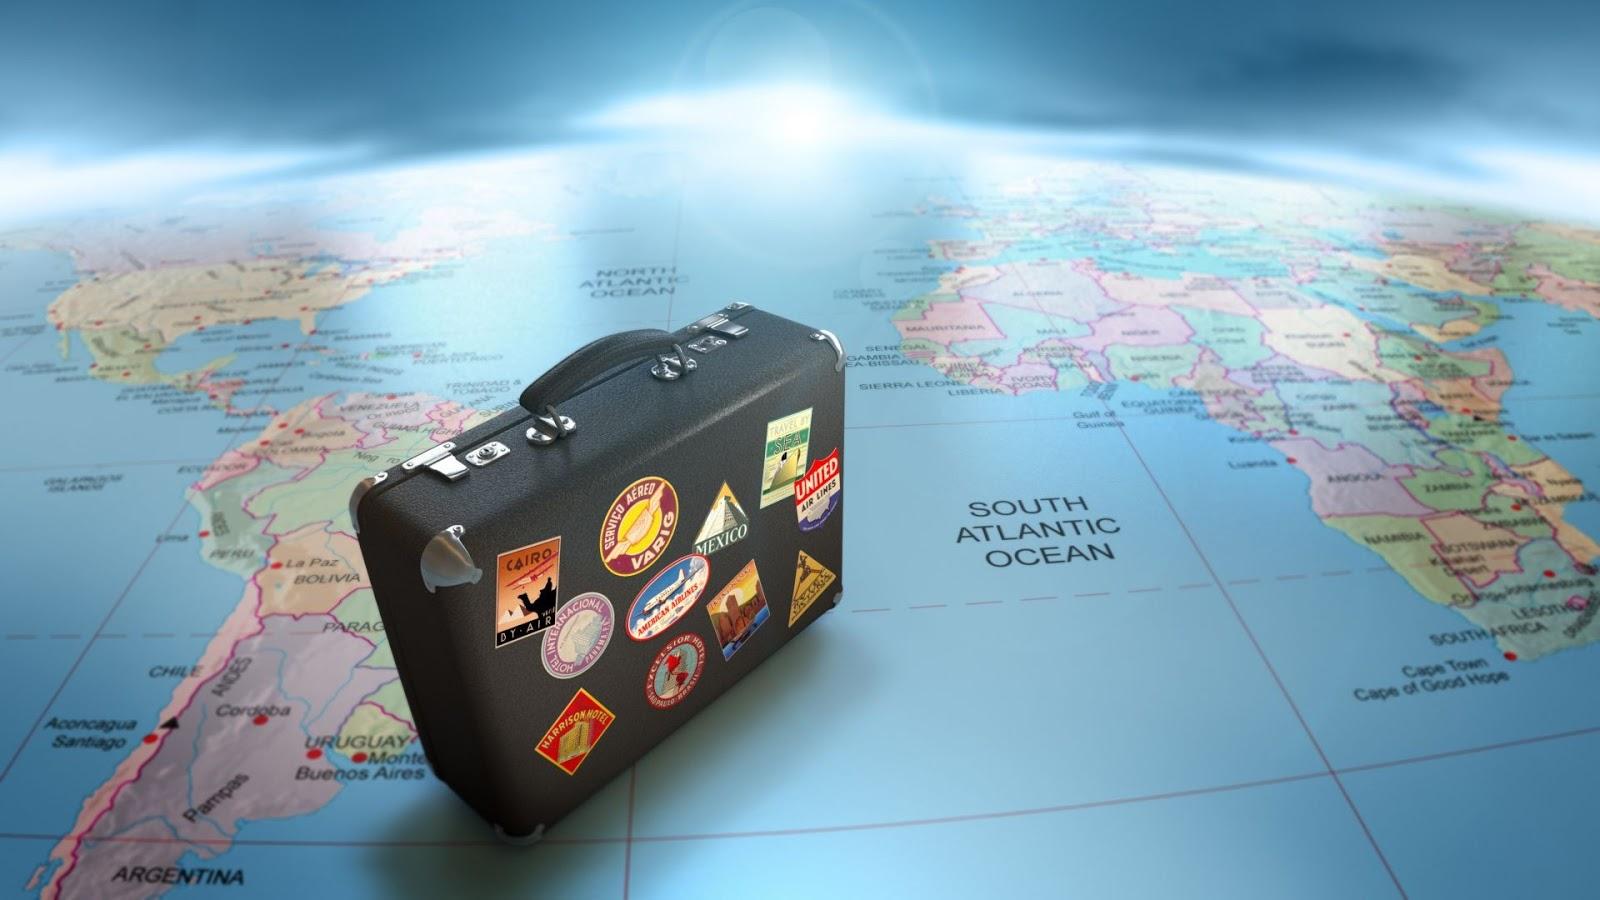 International Travel Medical Insurance Coverage